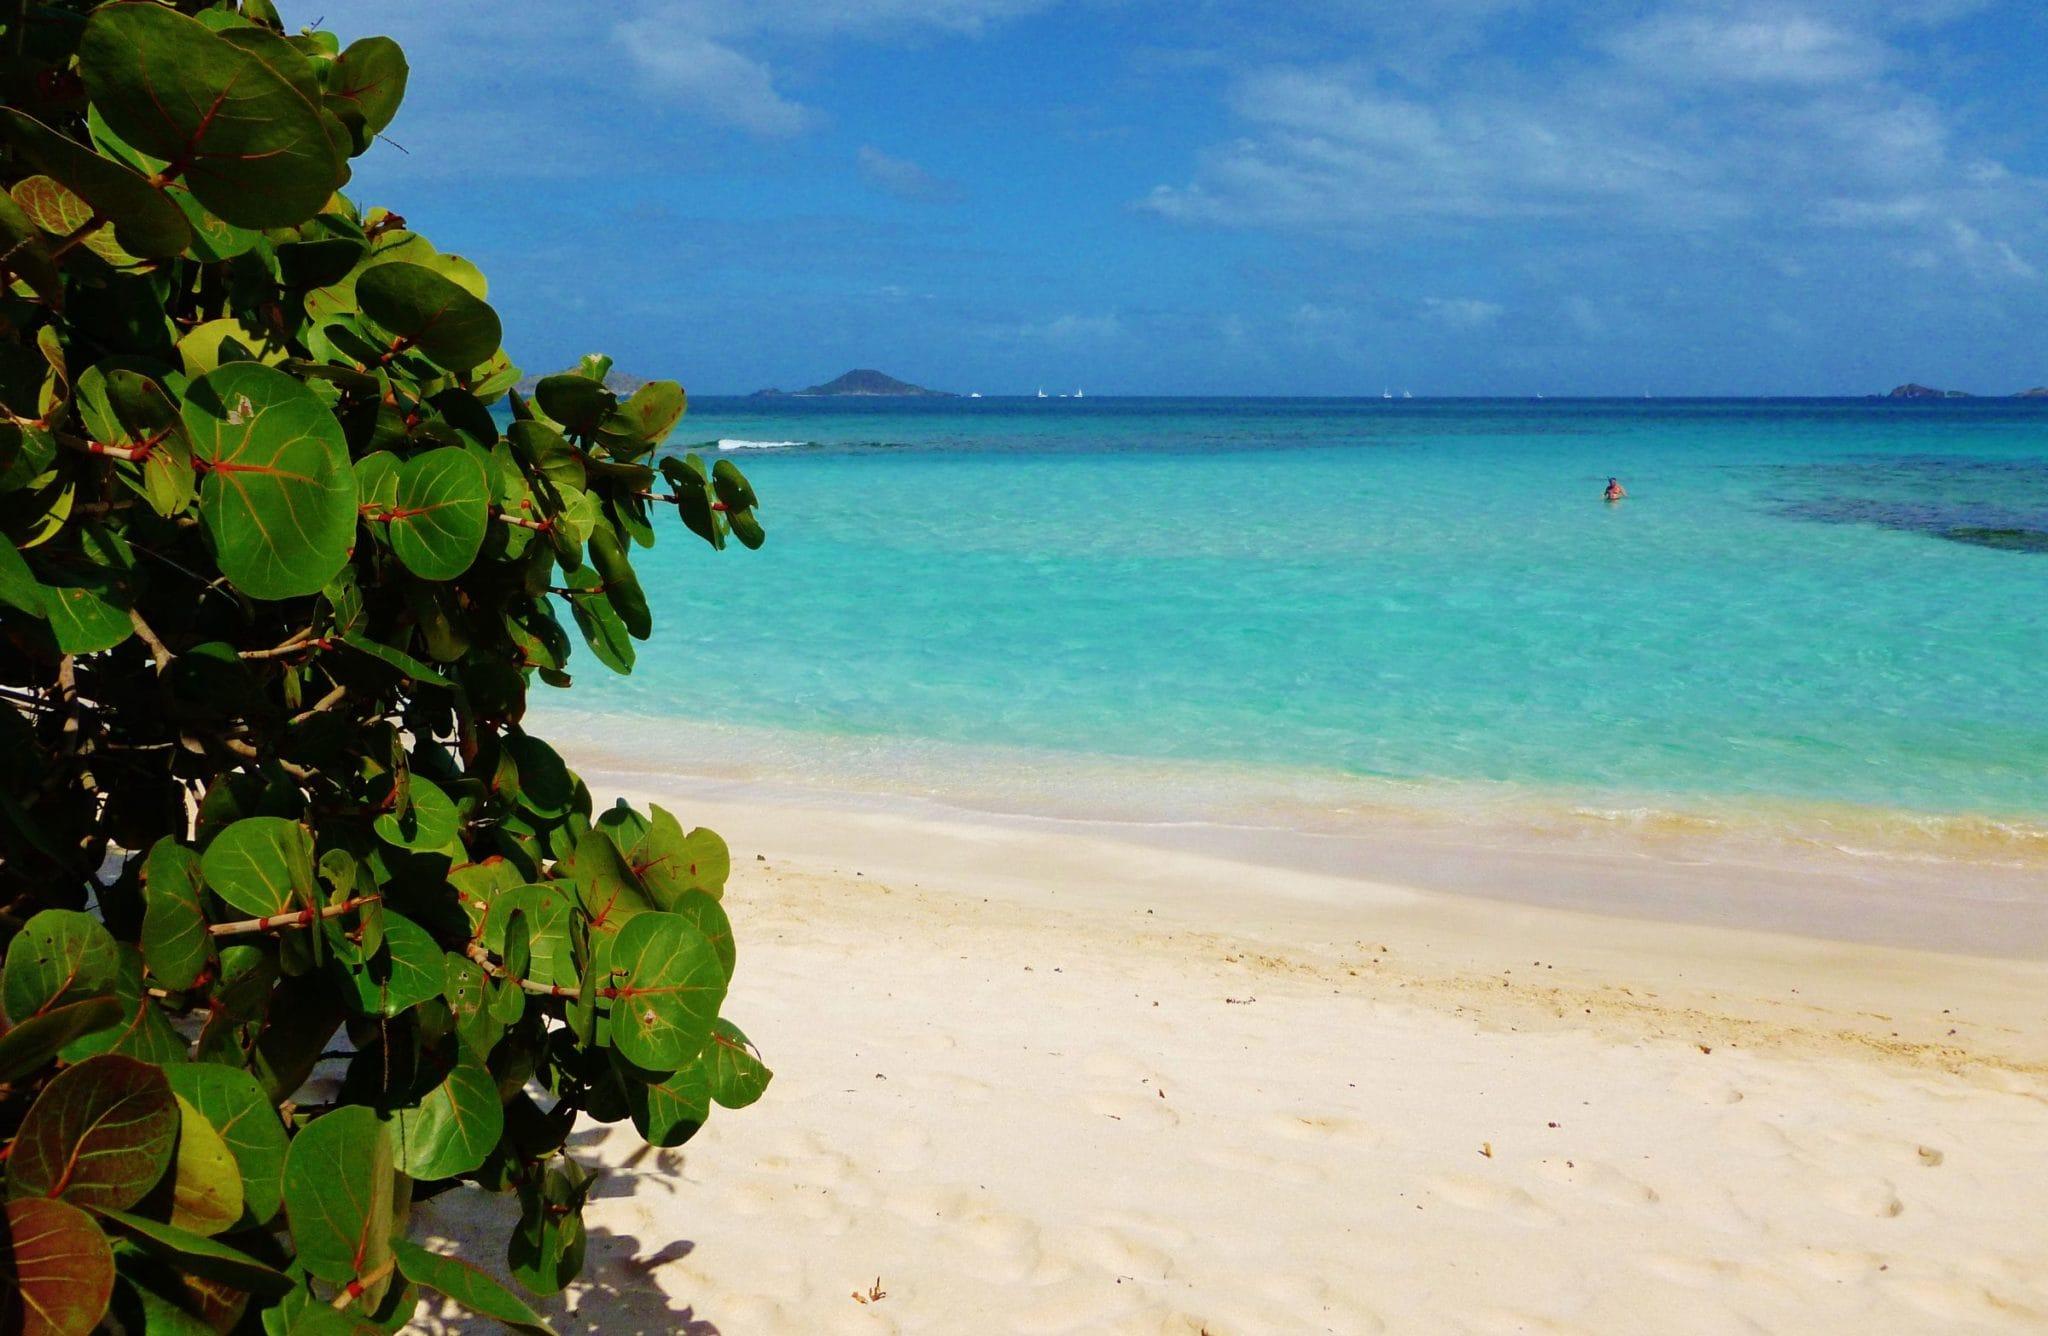 Beachin' It in the BVI's: Wish You Were Here